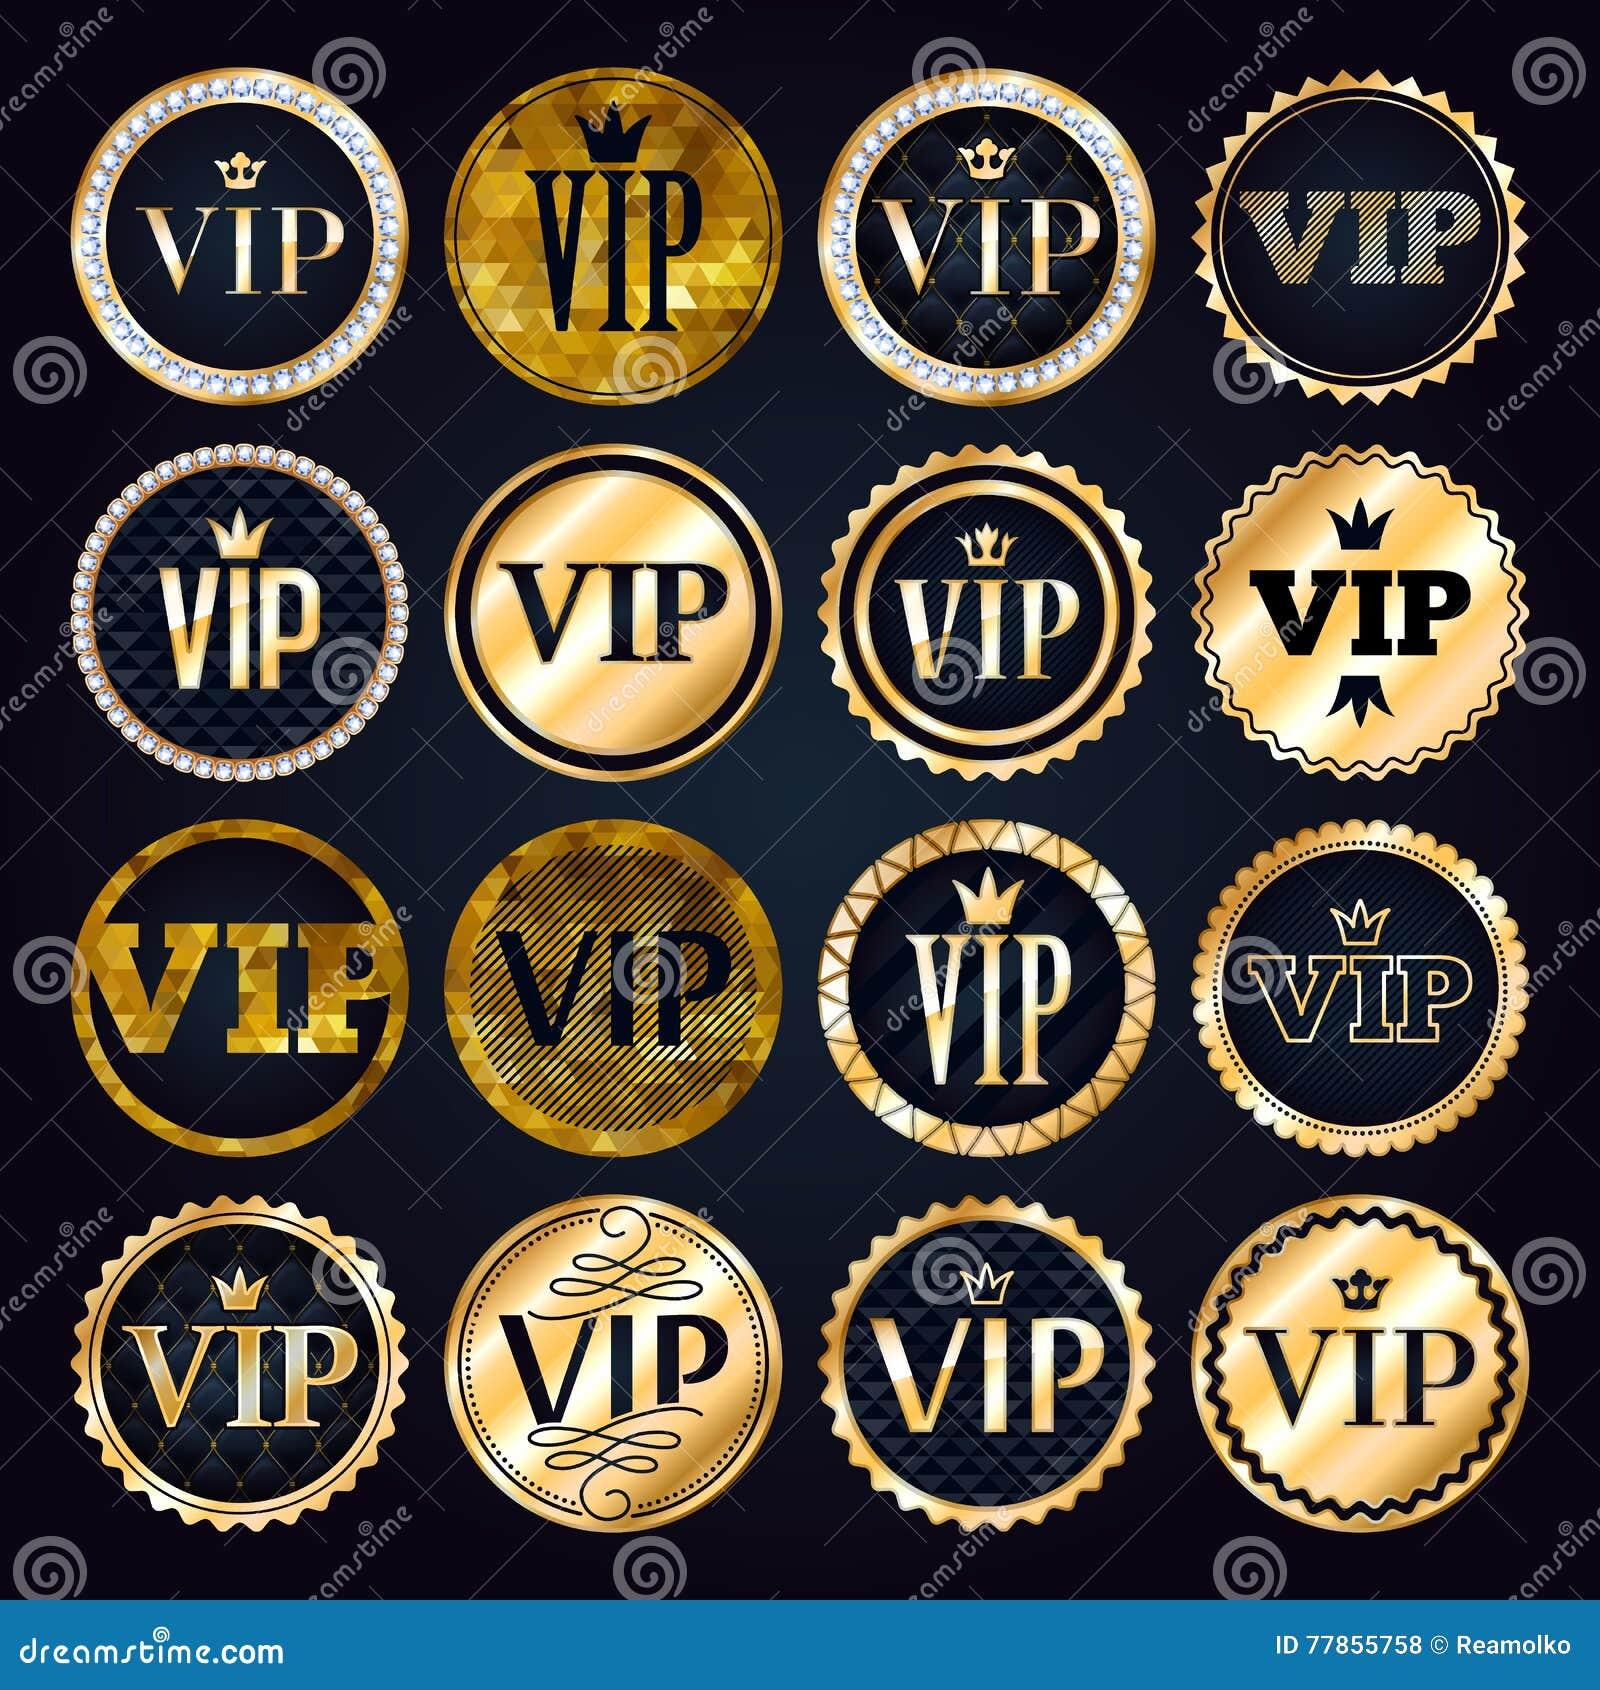 vip premium golden badges set stock vector illustration of emblem